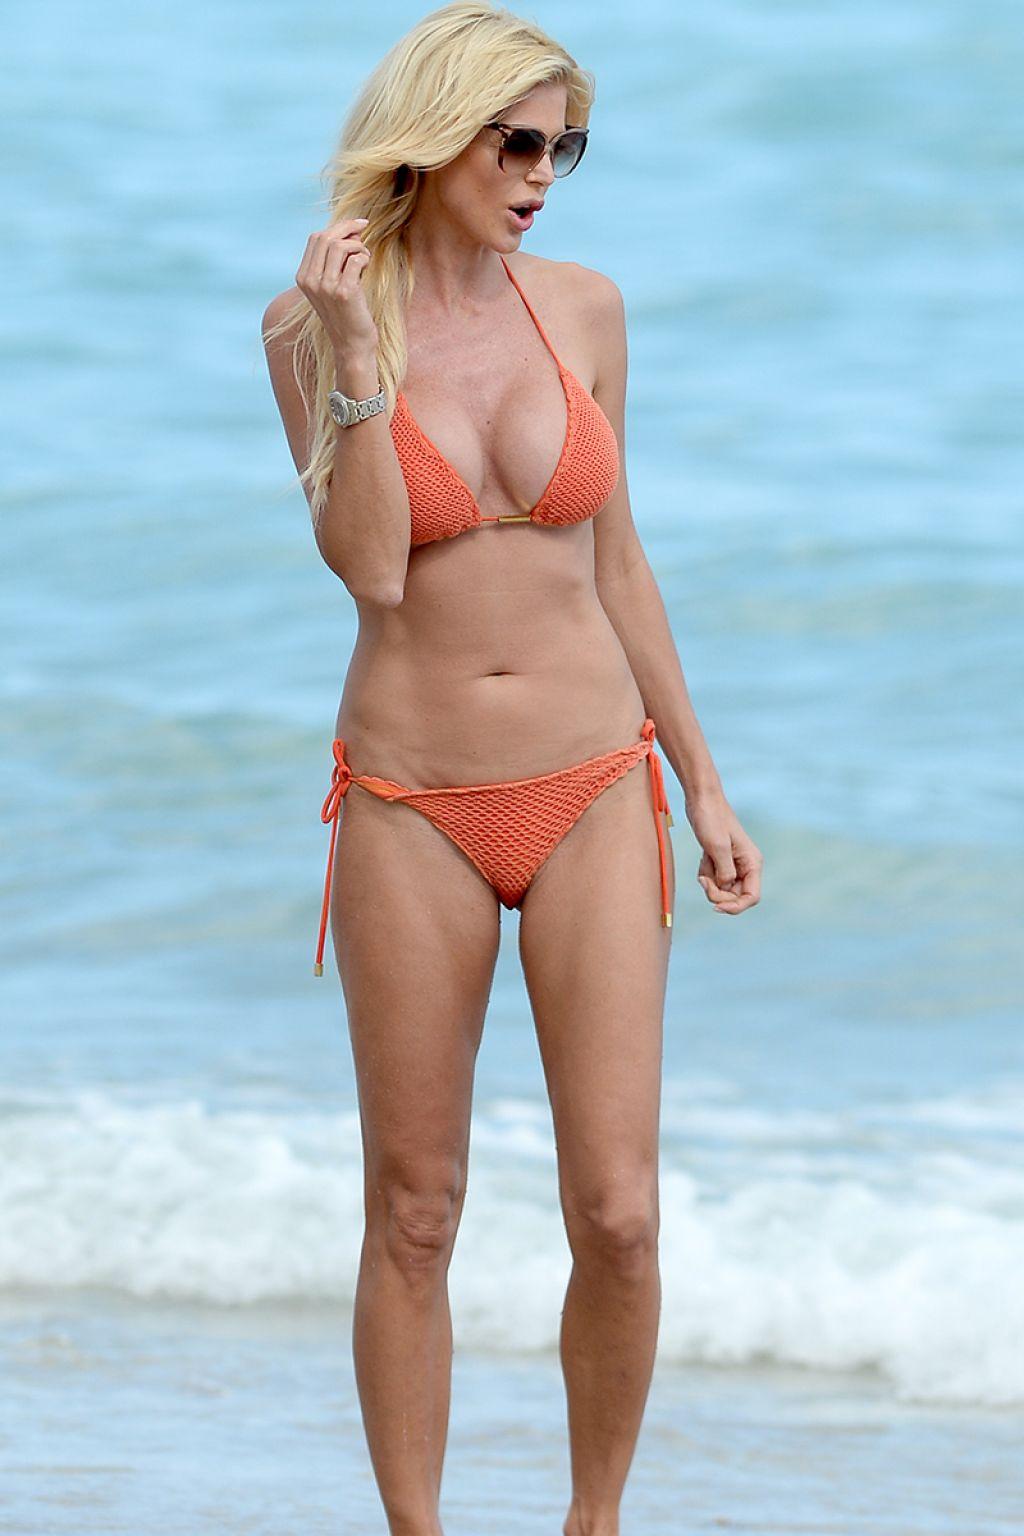 Bikini Victoria Silvstedt nude (92 foto and video), Ass, Bikini, Twitter, panties 2015